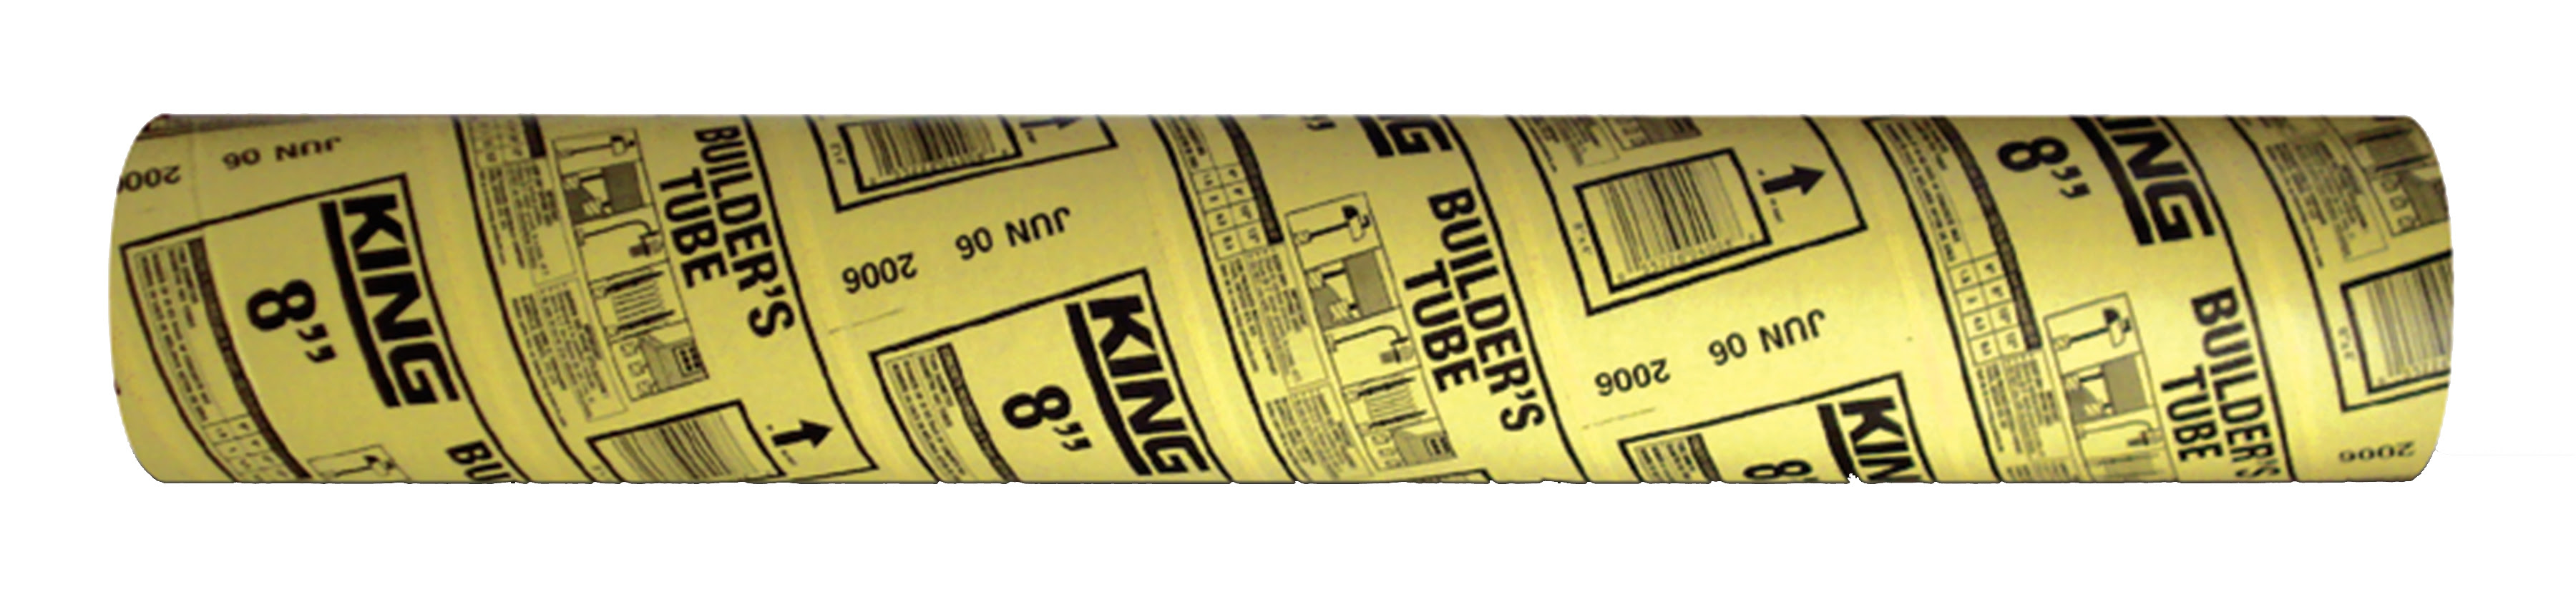 Impressive KING Builders' Tubes 3600 x 831 · 1245 kB · jpeg